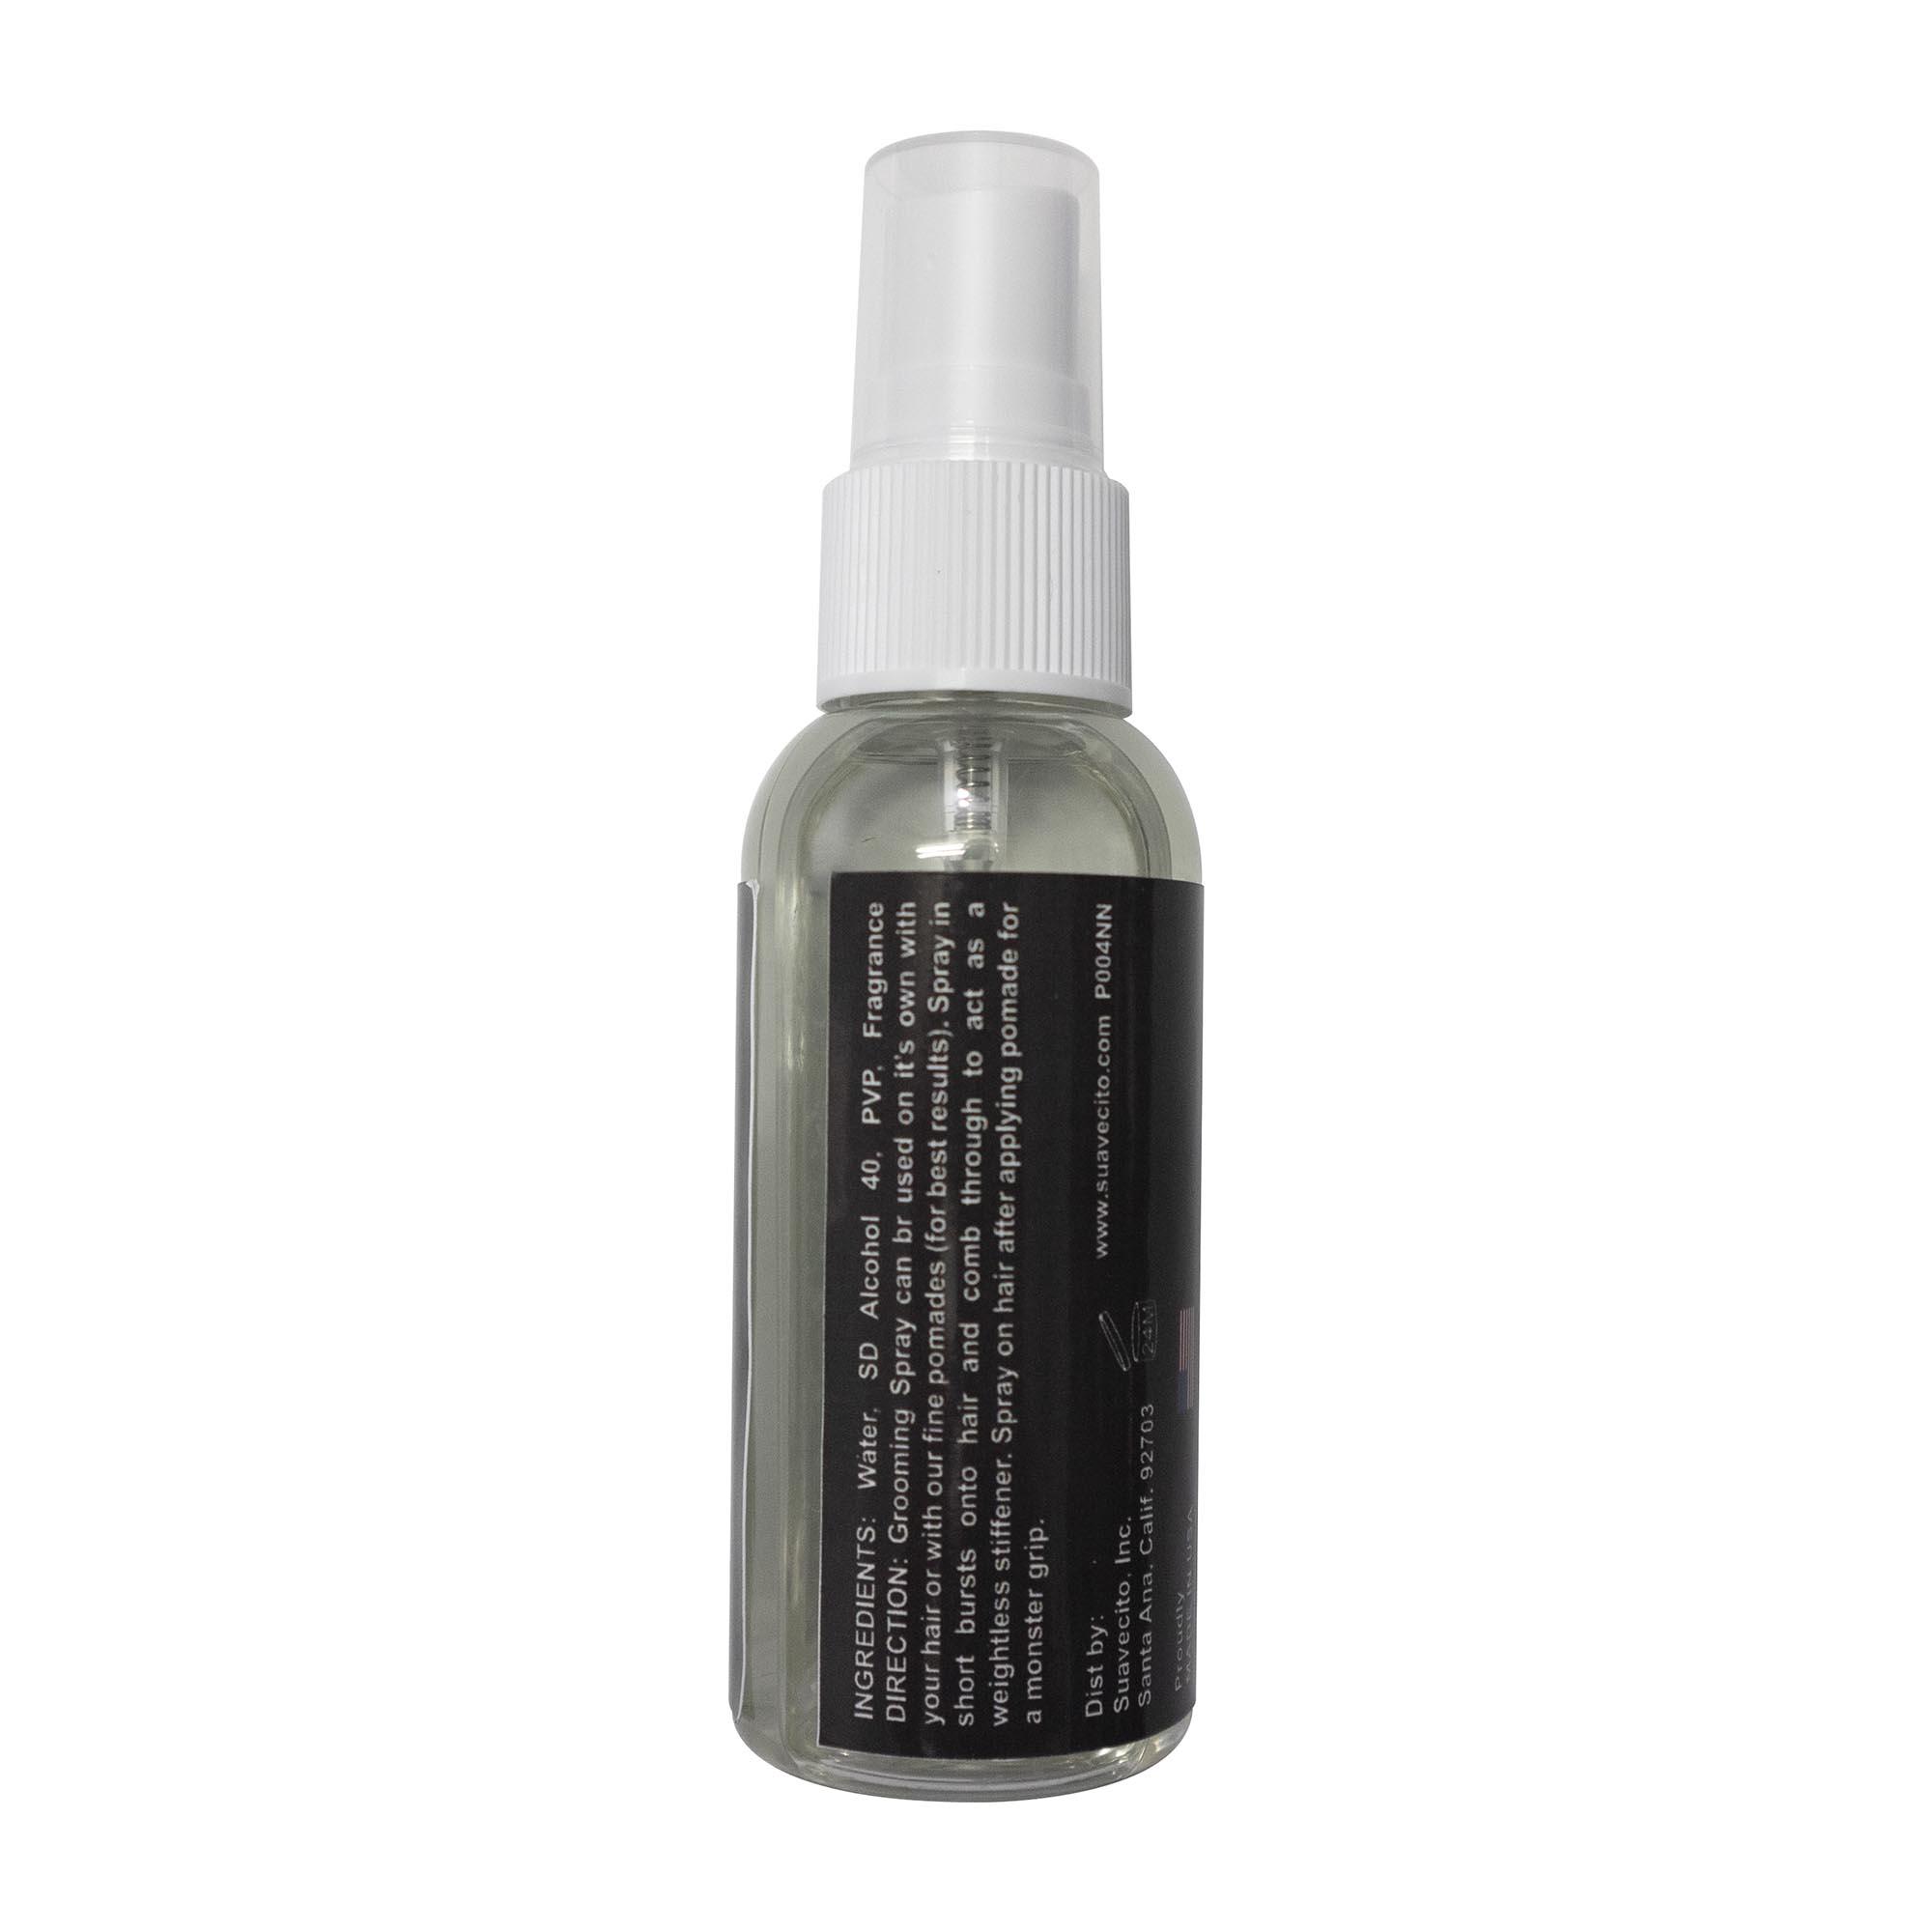 suavecito-grooming-spray-50ml-02